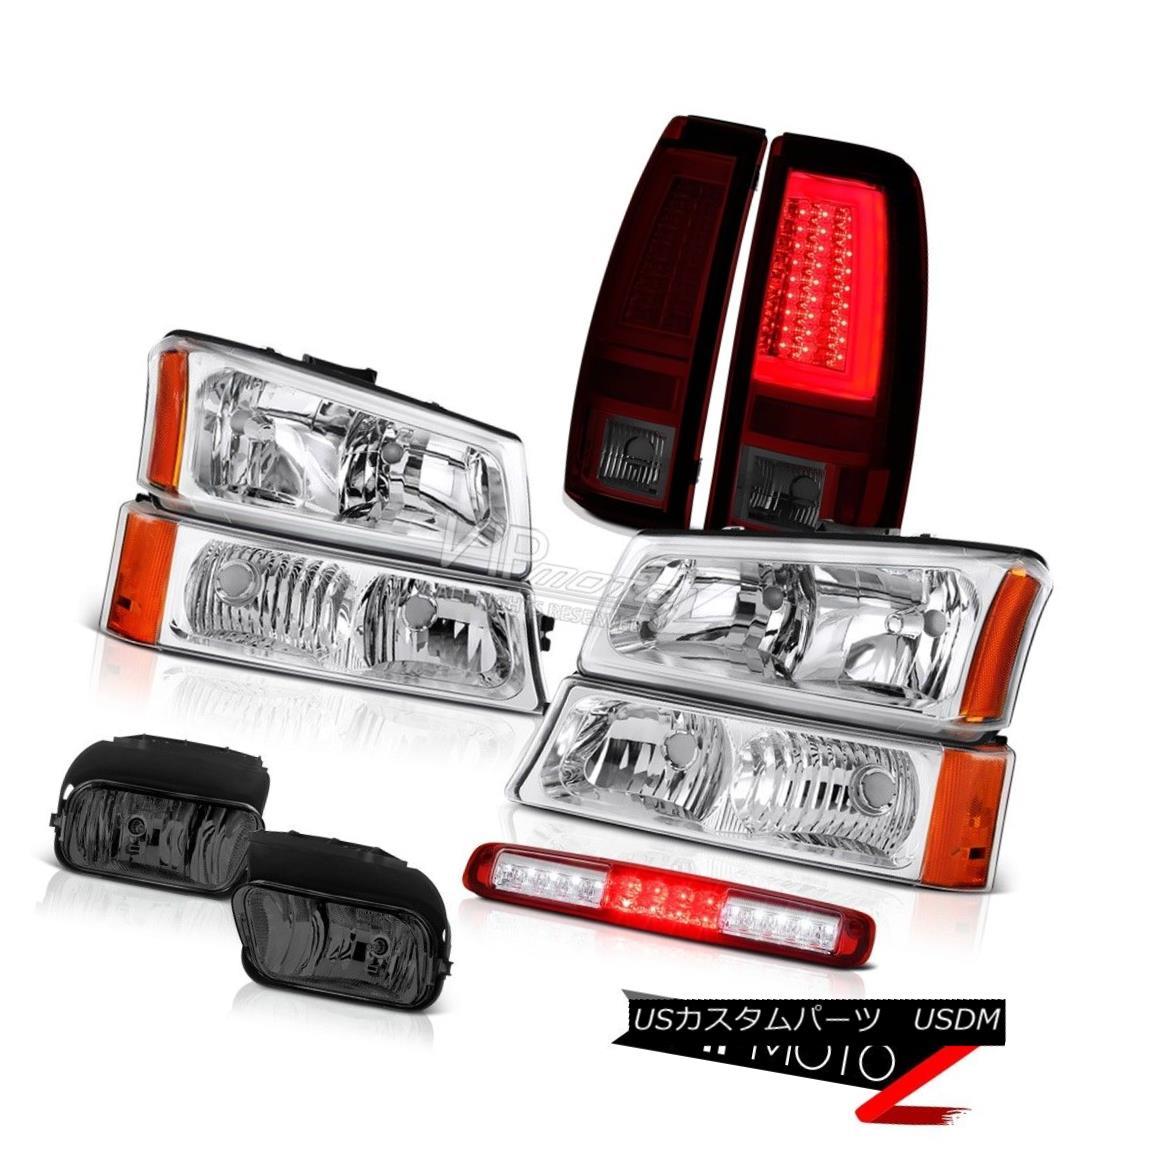 94-98 CHEVY FULL SIZE HEADLIGHTS BLACK HALO 10 PCS ALTEZZA TAIL LIGHTS RED SMOK